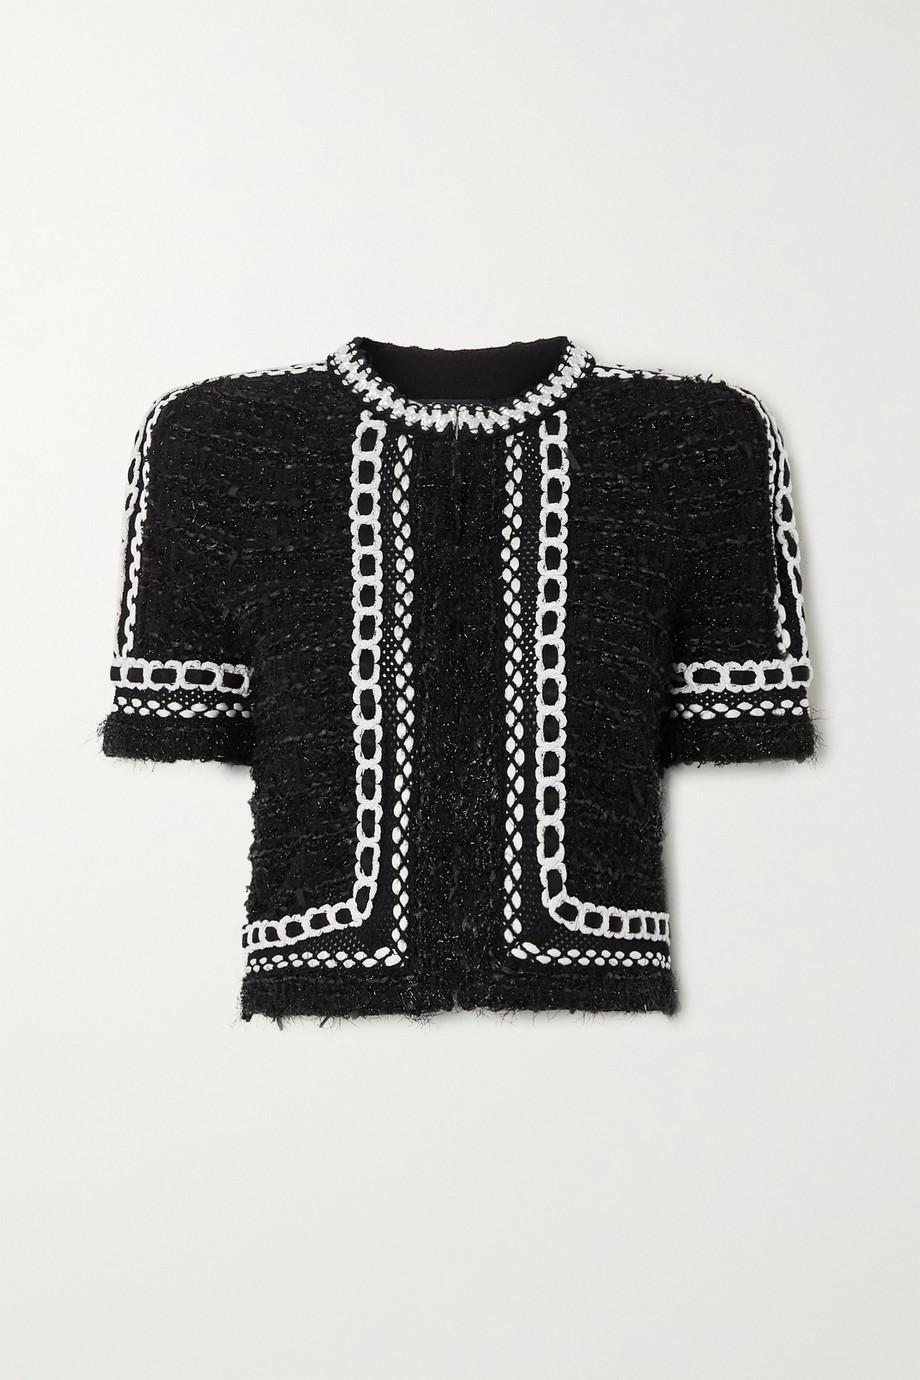 Balmain Cropped embroidered metallic tweed jacket